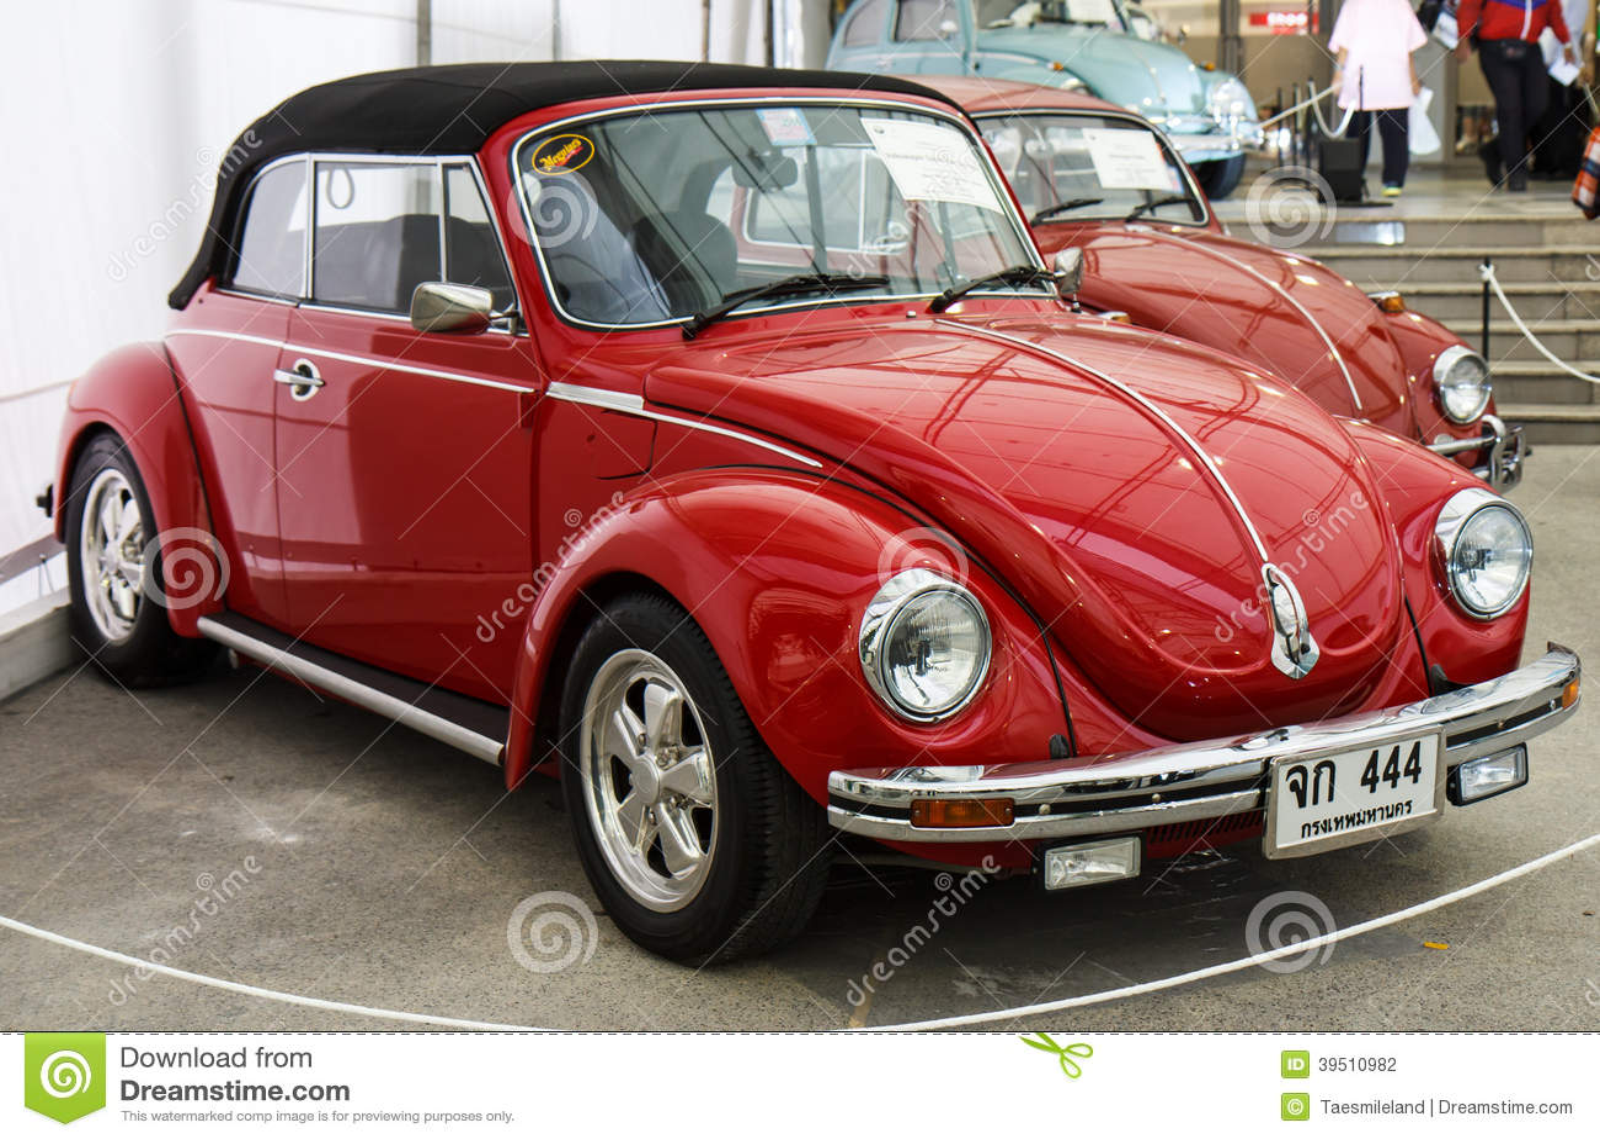 BANGKOK - JUNE 22 Volkswagen Beetle on display at The 36th Bangkok Vintage Car Concours on June 22, 2012 in Bangkok, Thailand